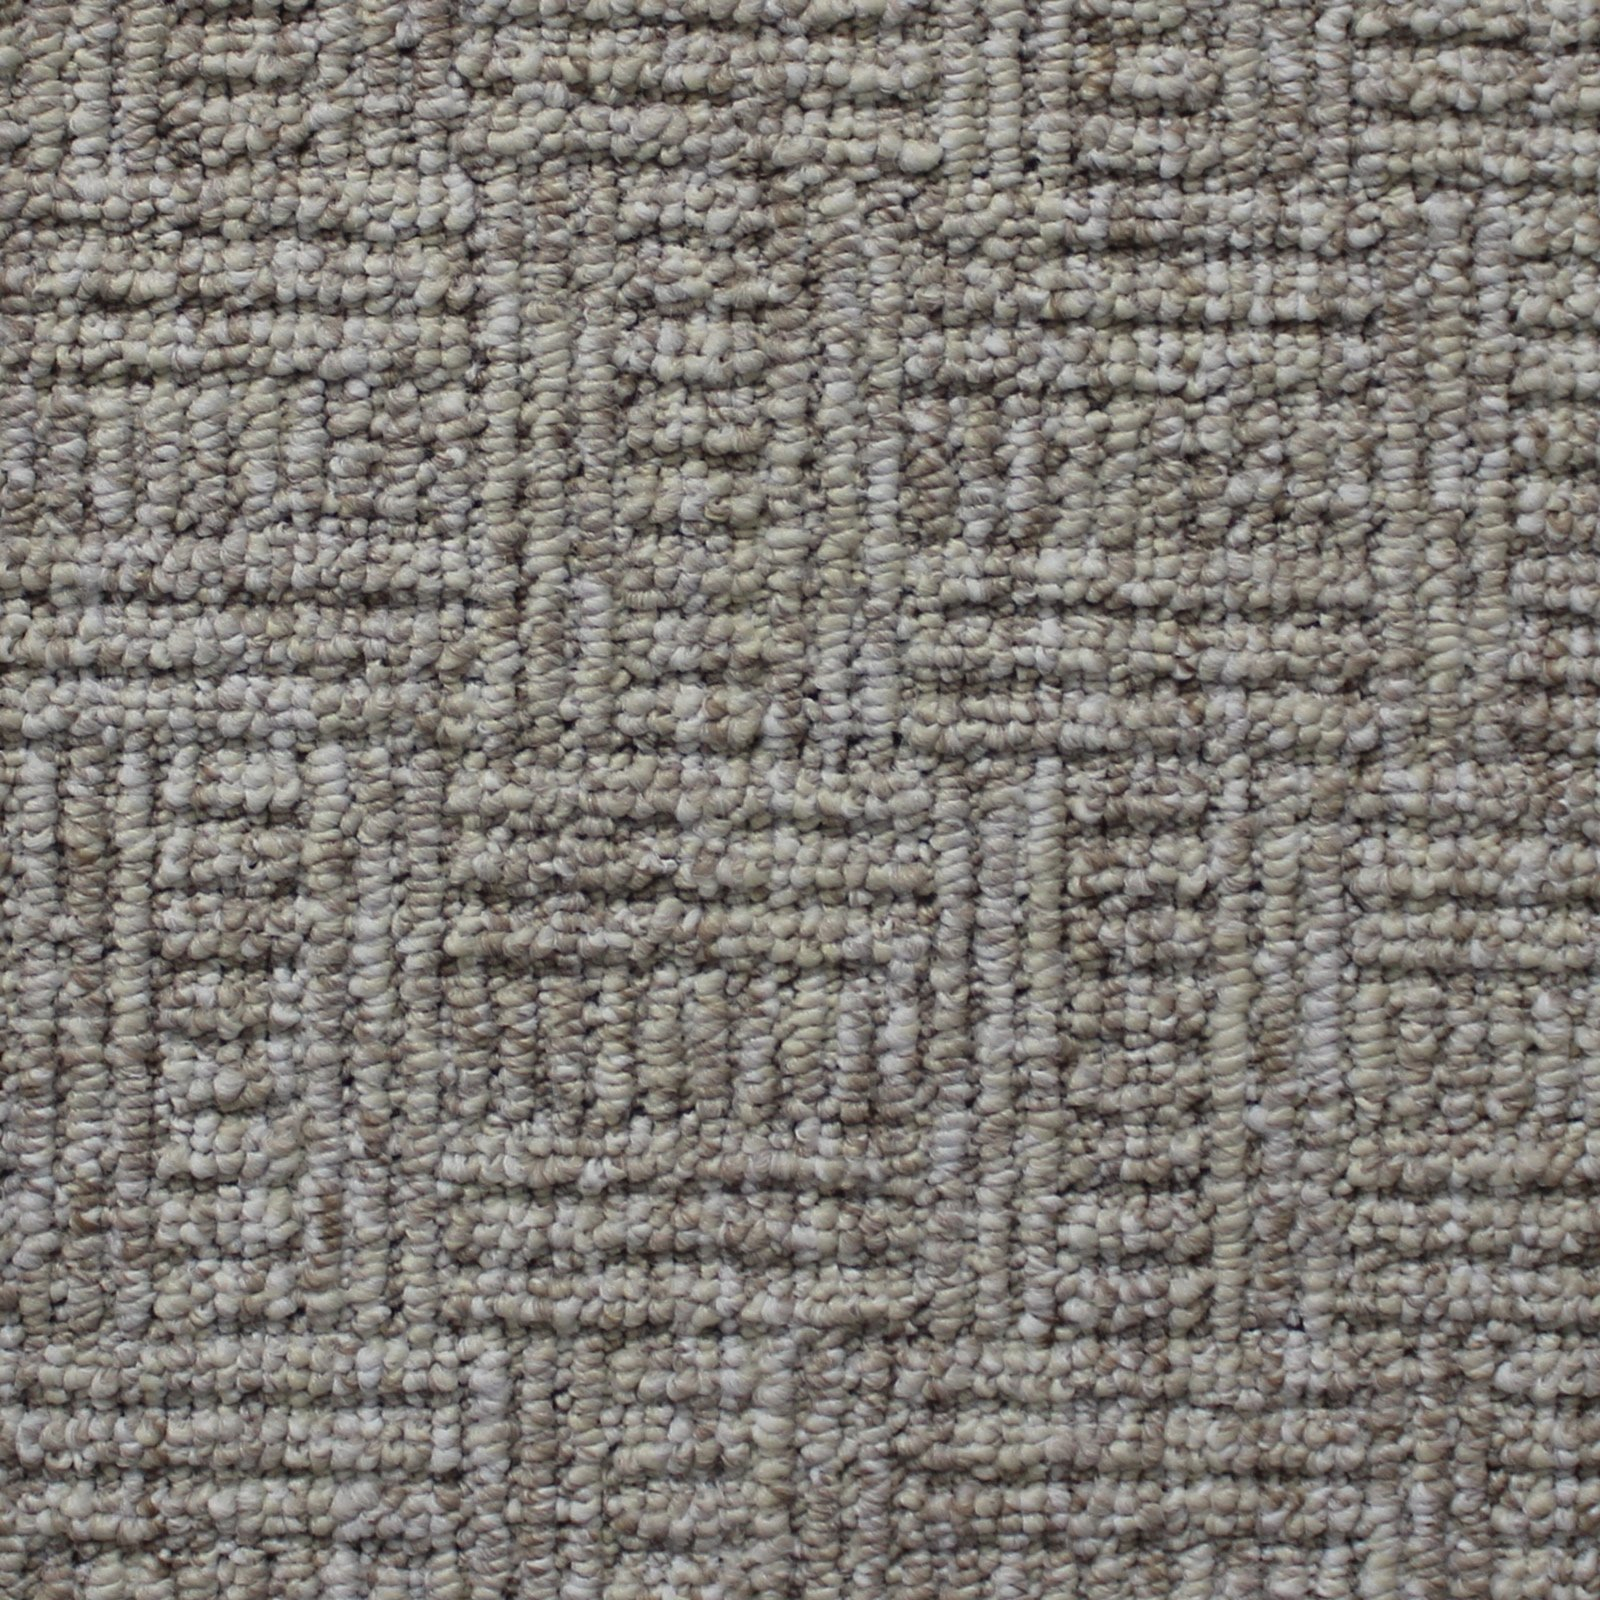 teppichboden oberhof creme 4 meter breit teppichboden bodenbel ge baumarkt roller. Black Bedroom Furniture Sets. Home Design Ideas